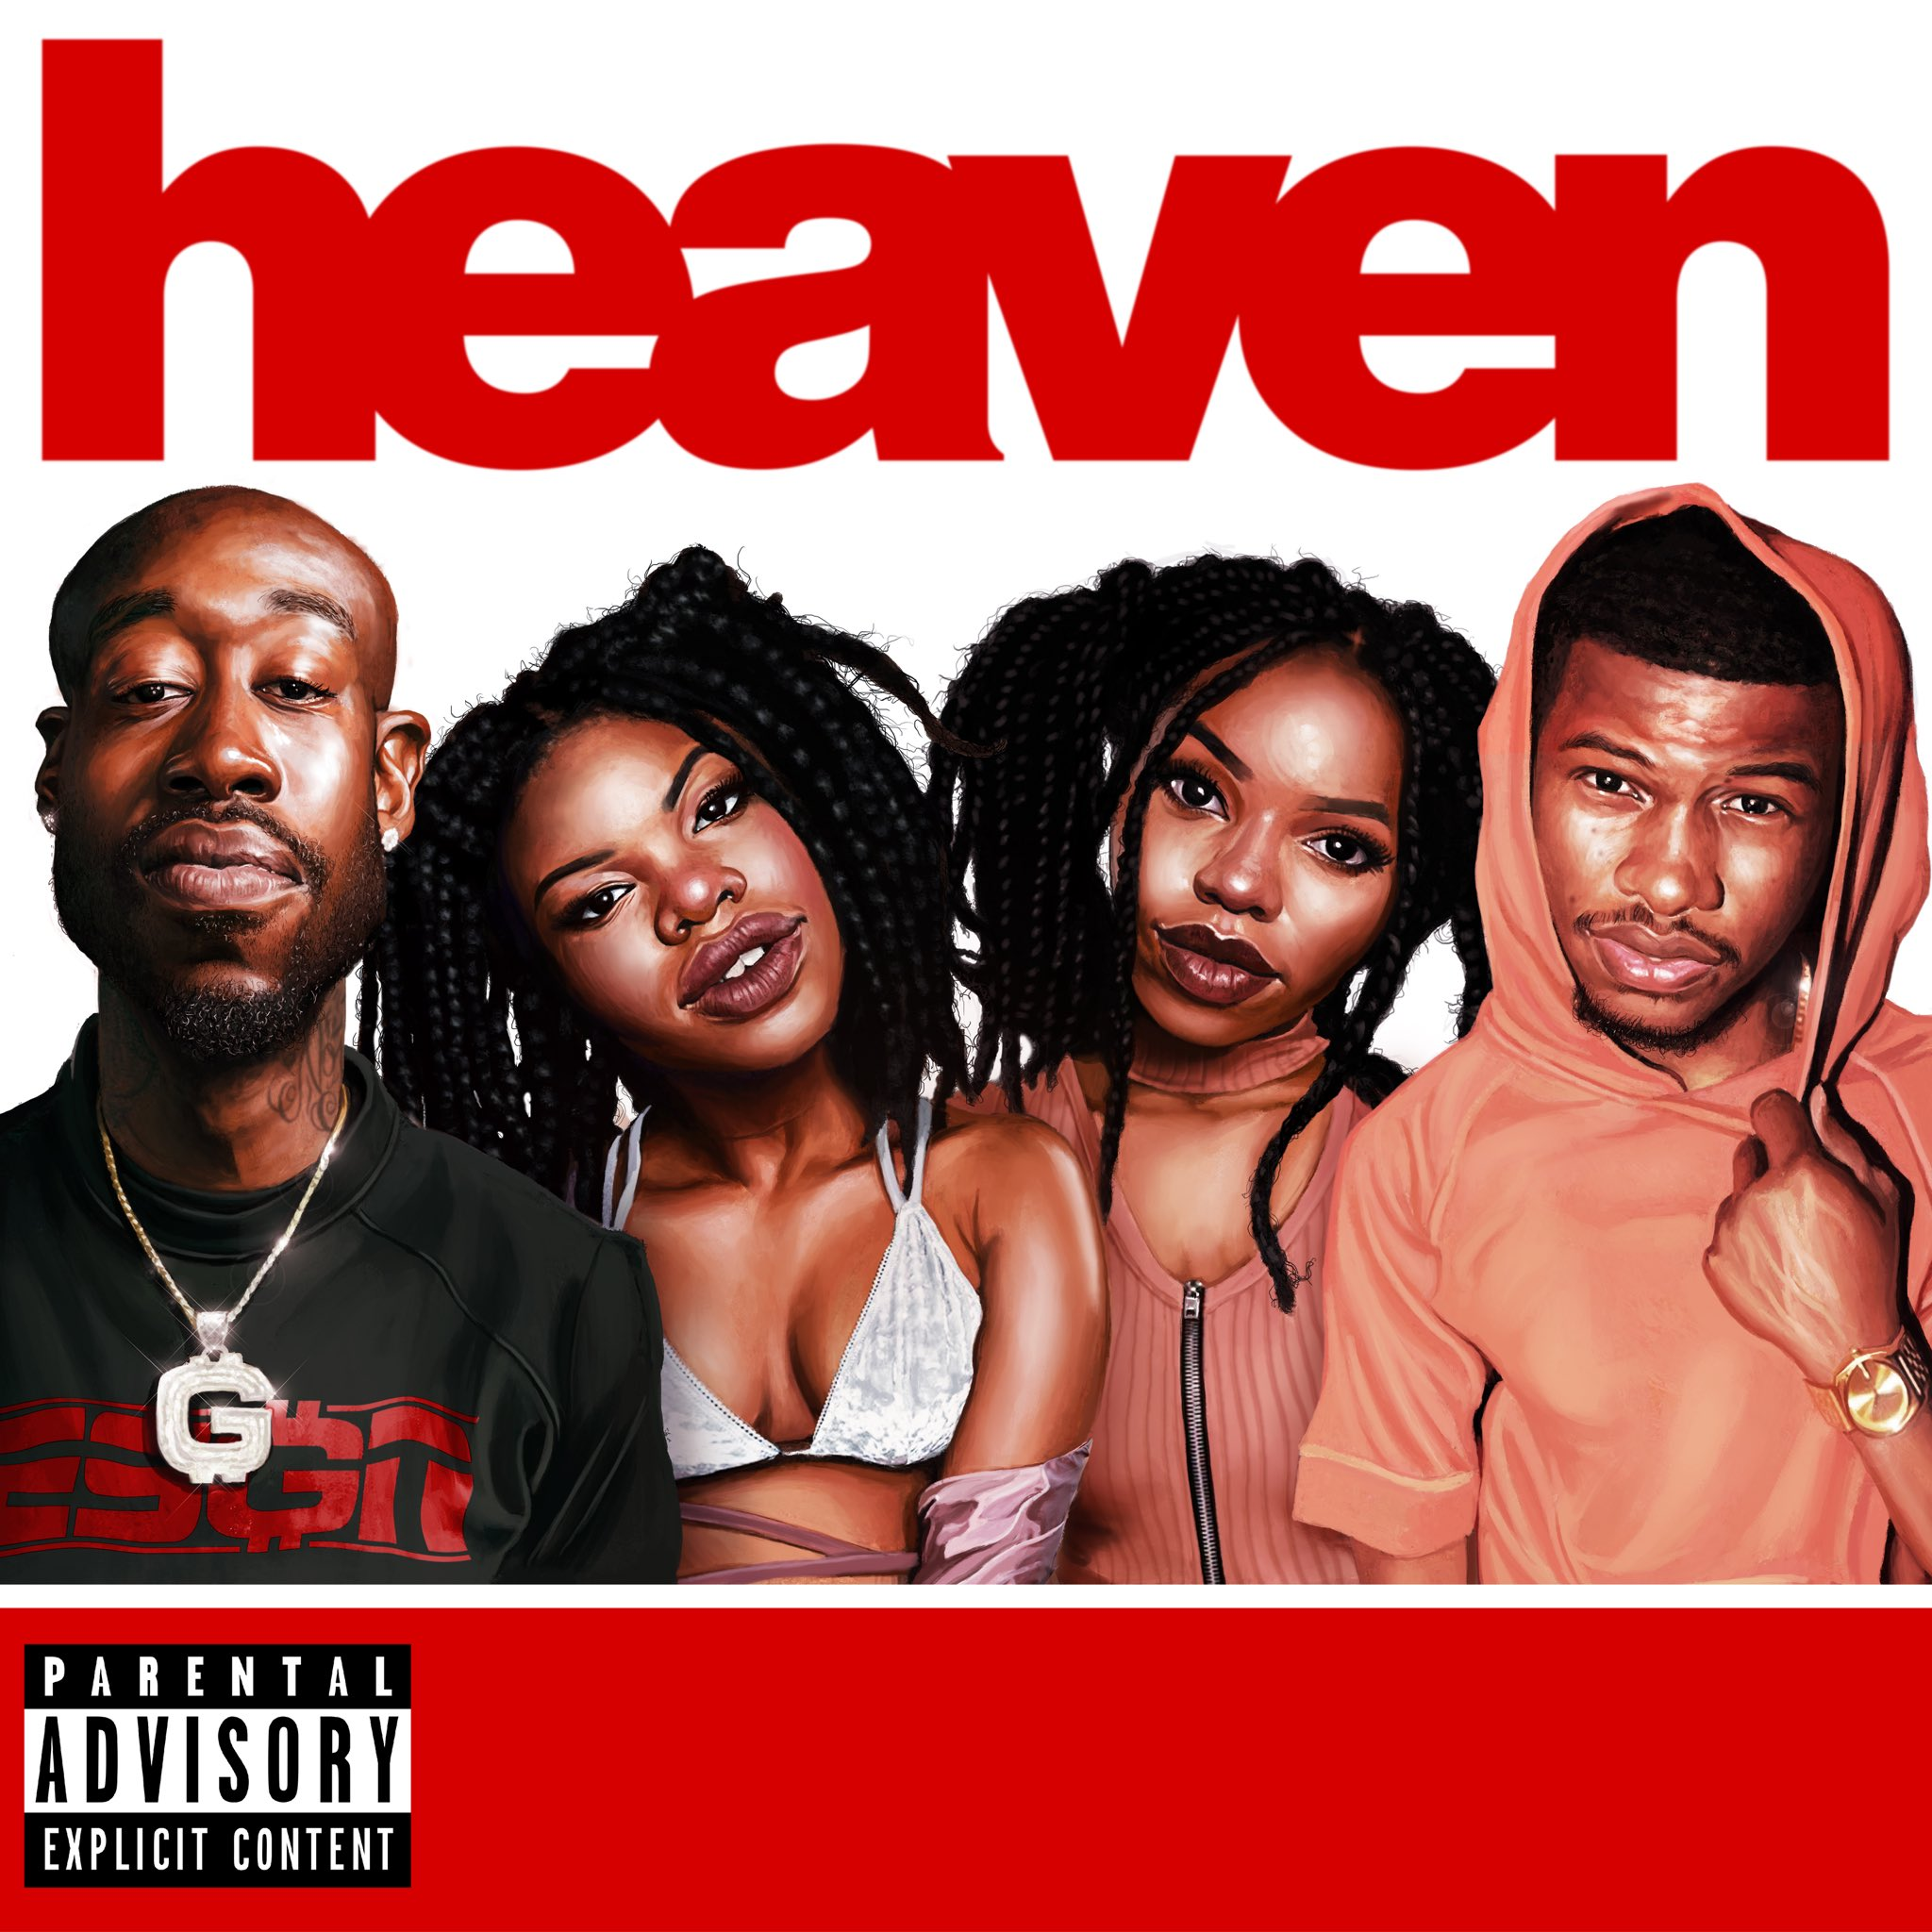 "New shit w/ @IAMNOBODI @NickGrantmusic @vanjess   ""Heaven""  https://t.co/roXggEkyrn https://t.co/V7oeX19Dkn"